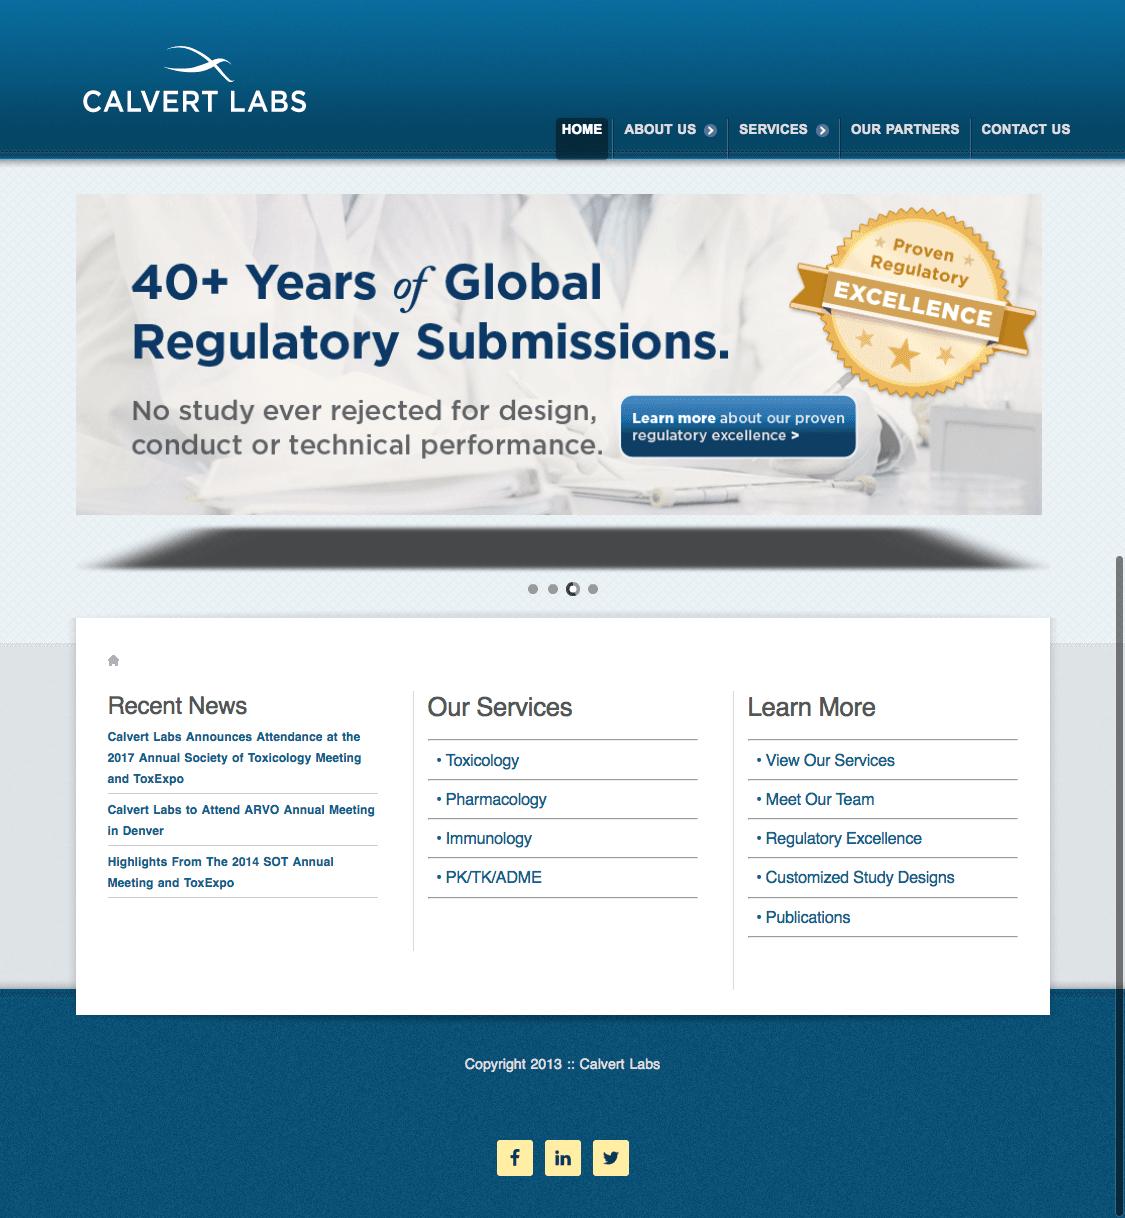 calvert labs - home page - pixallus